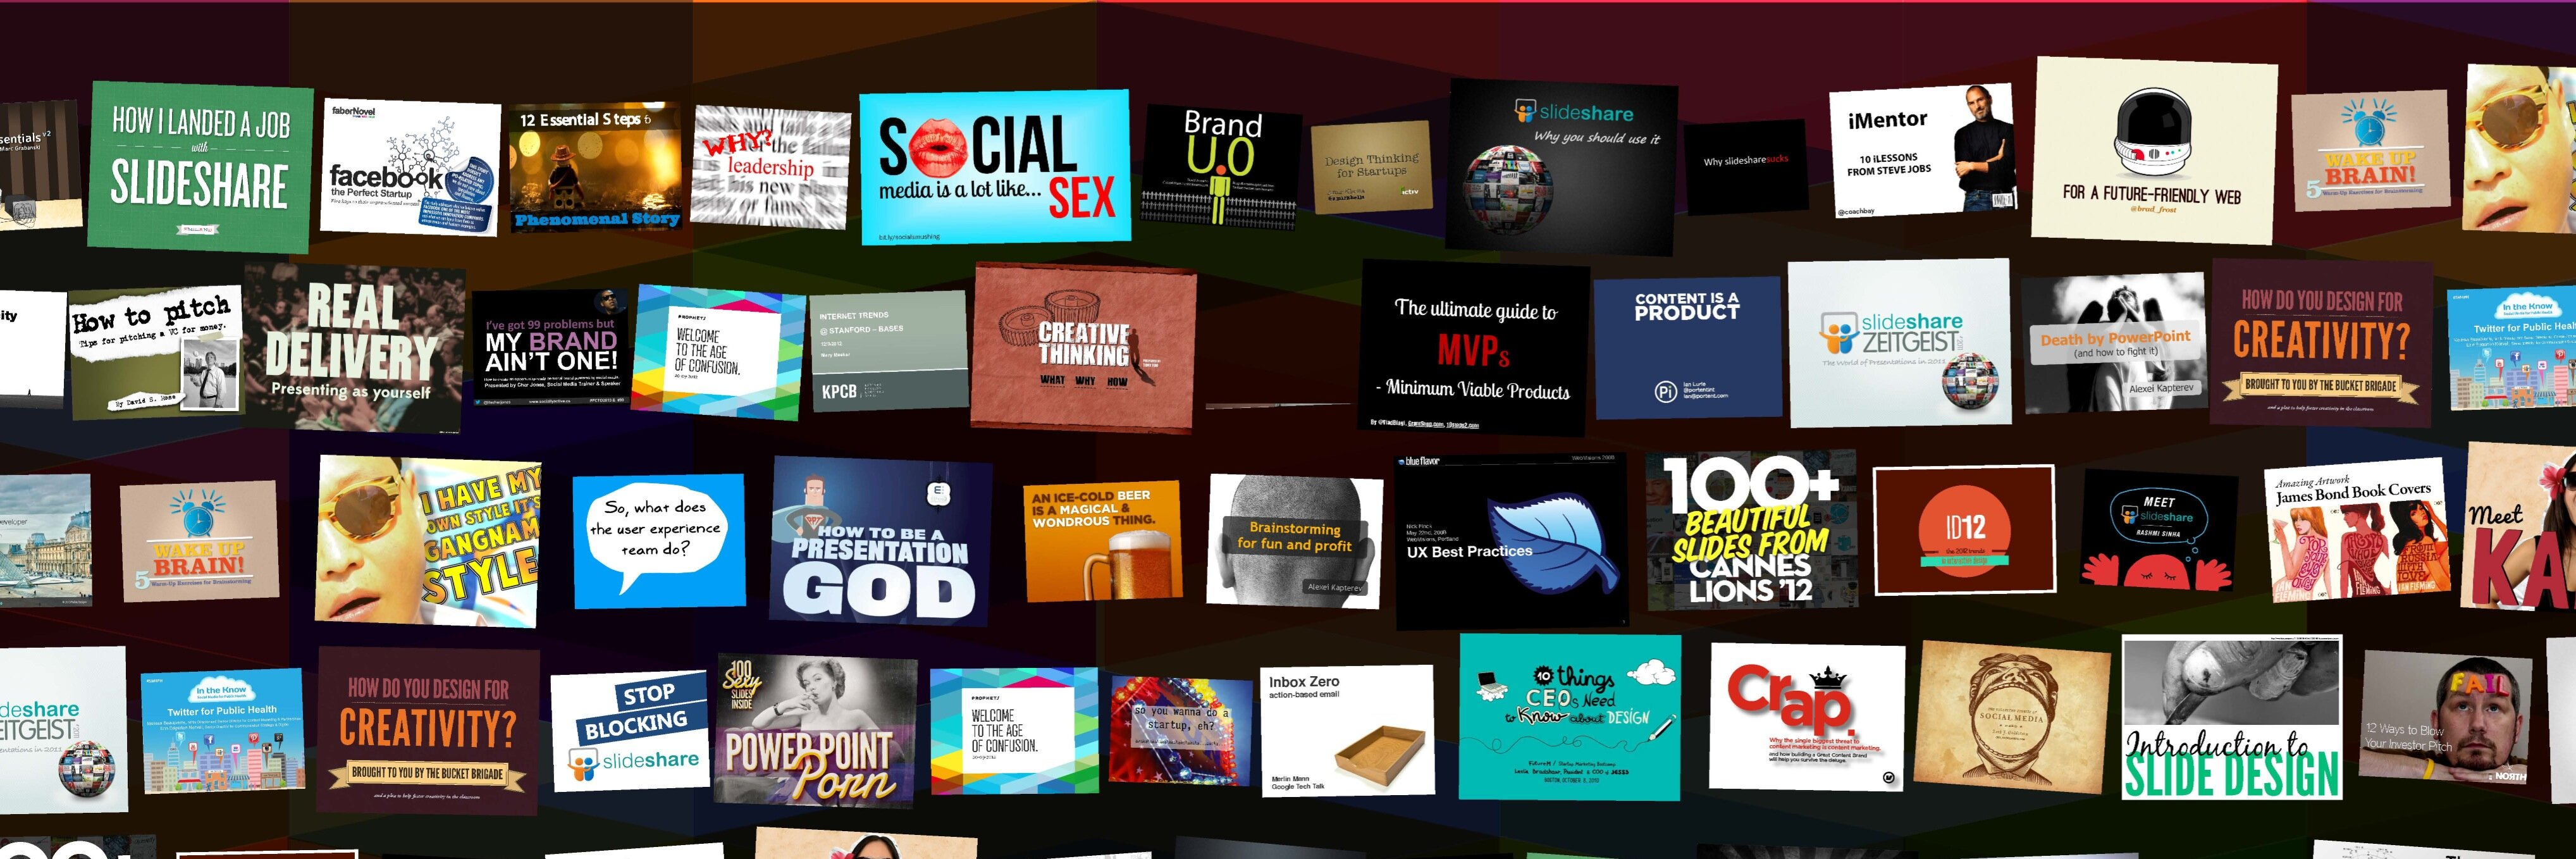 SlideShare cover image